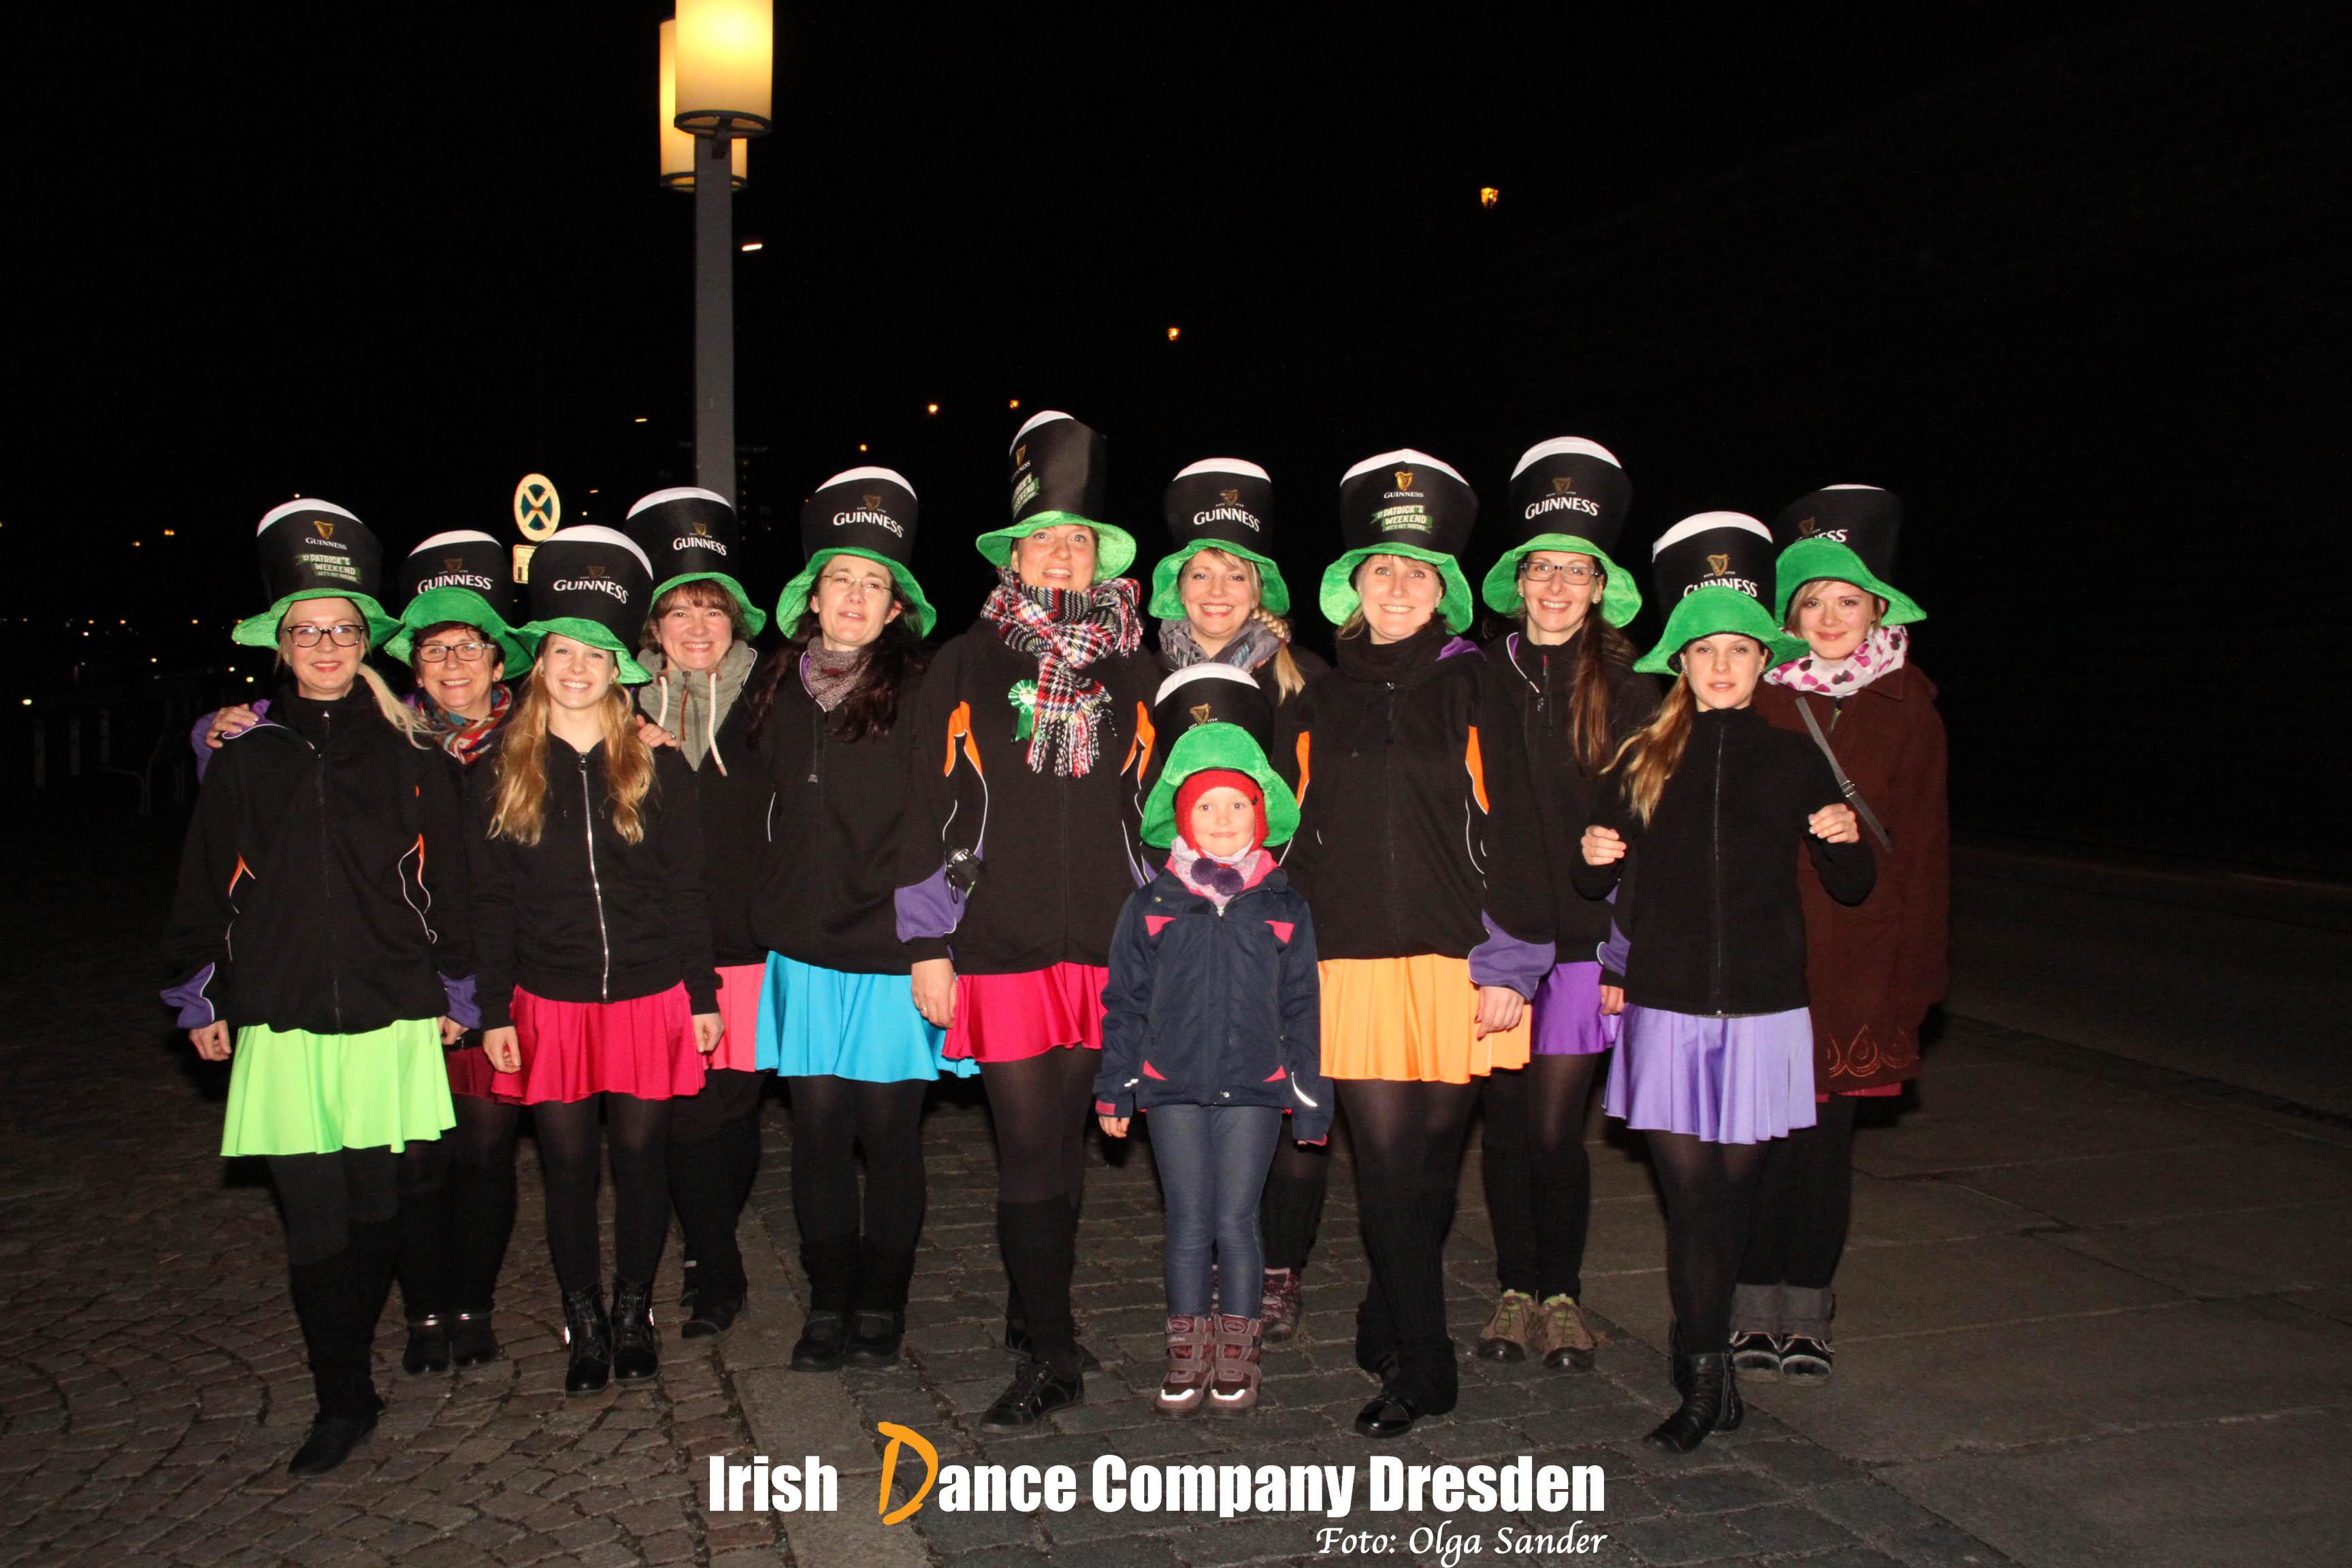 Irish Dance in Dresden